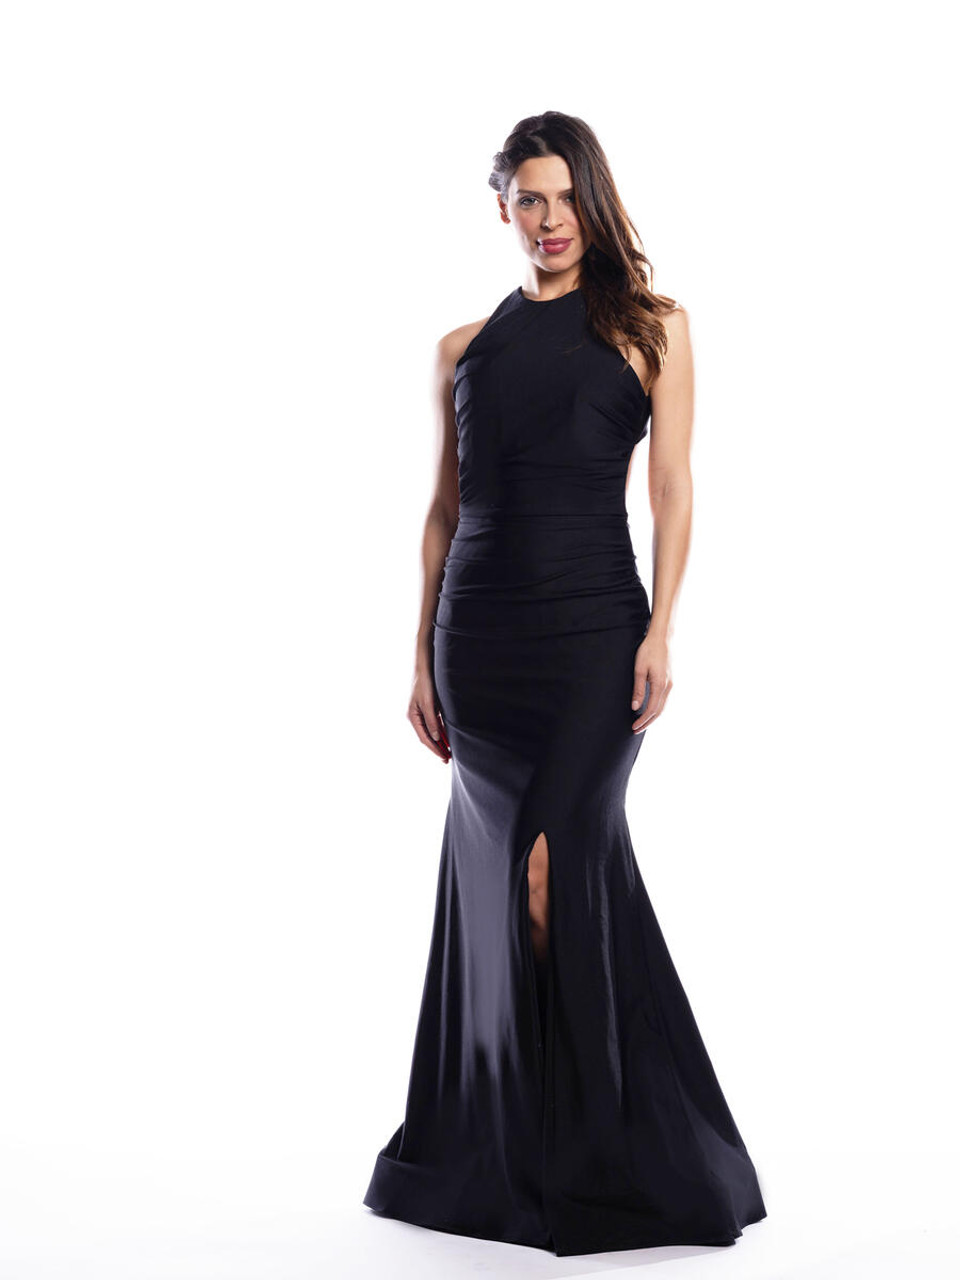 Bari Jay 2067 High Neck Halter Dress - Lux Stretch